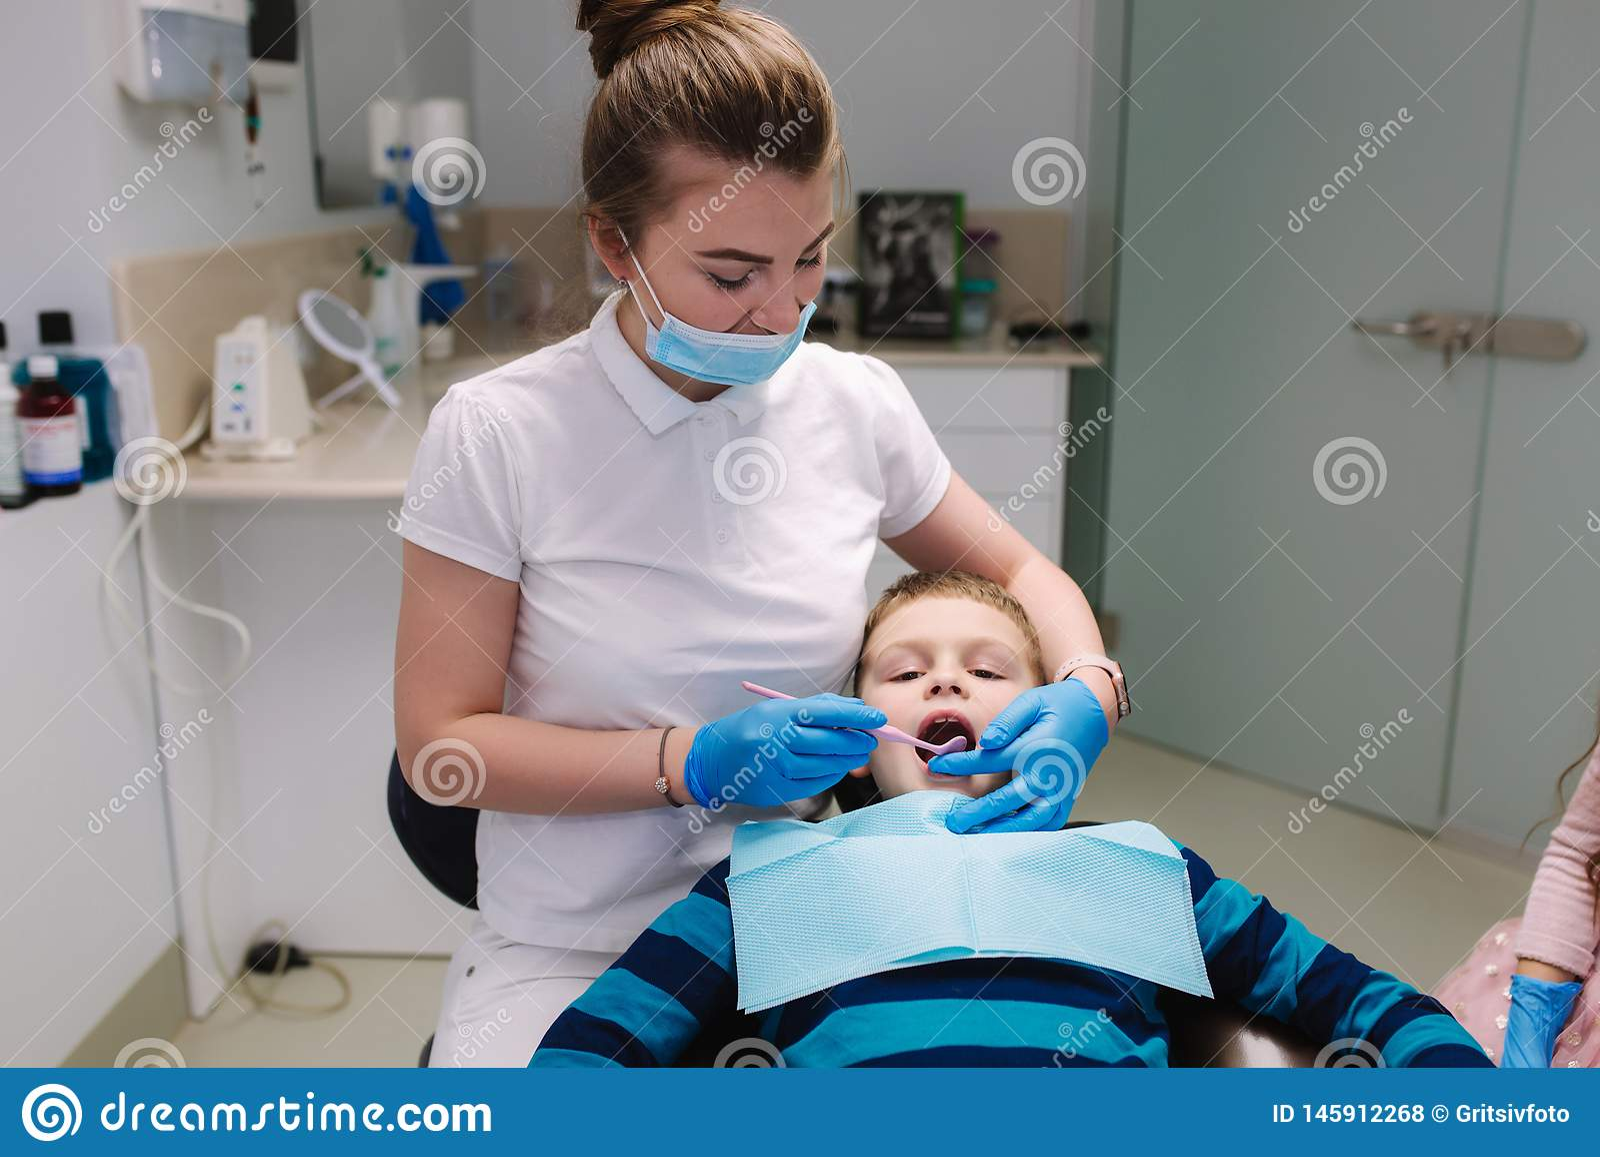 Little girl help female dentist, new teeth examinationand treatment of cavities